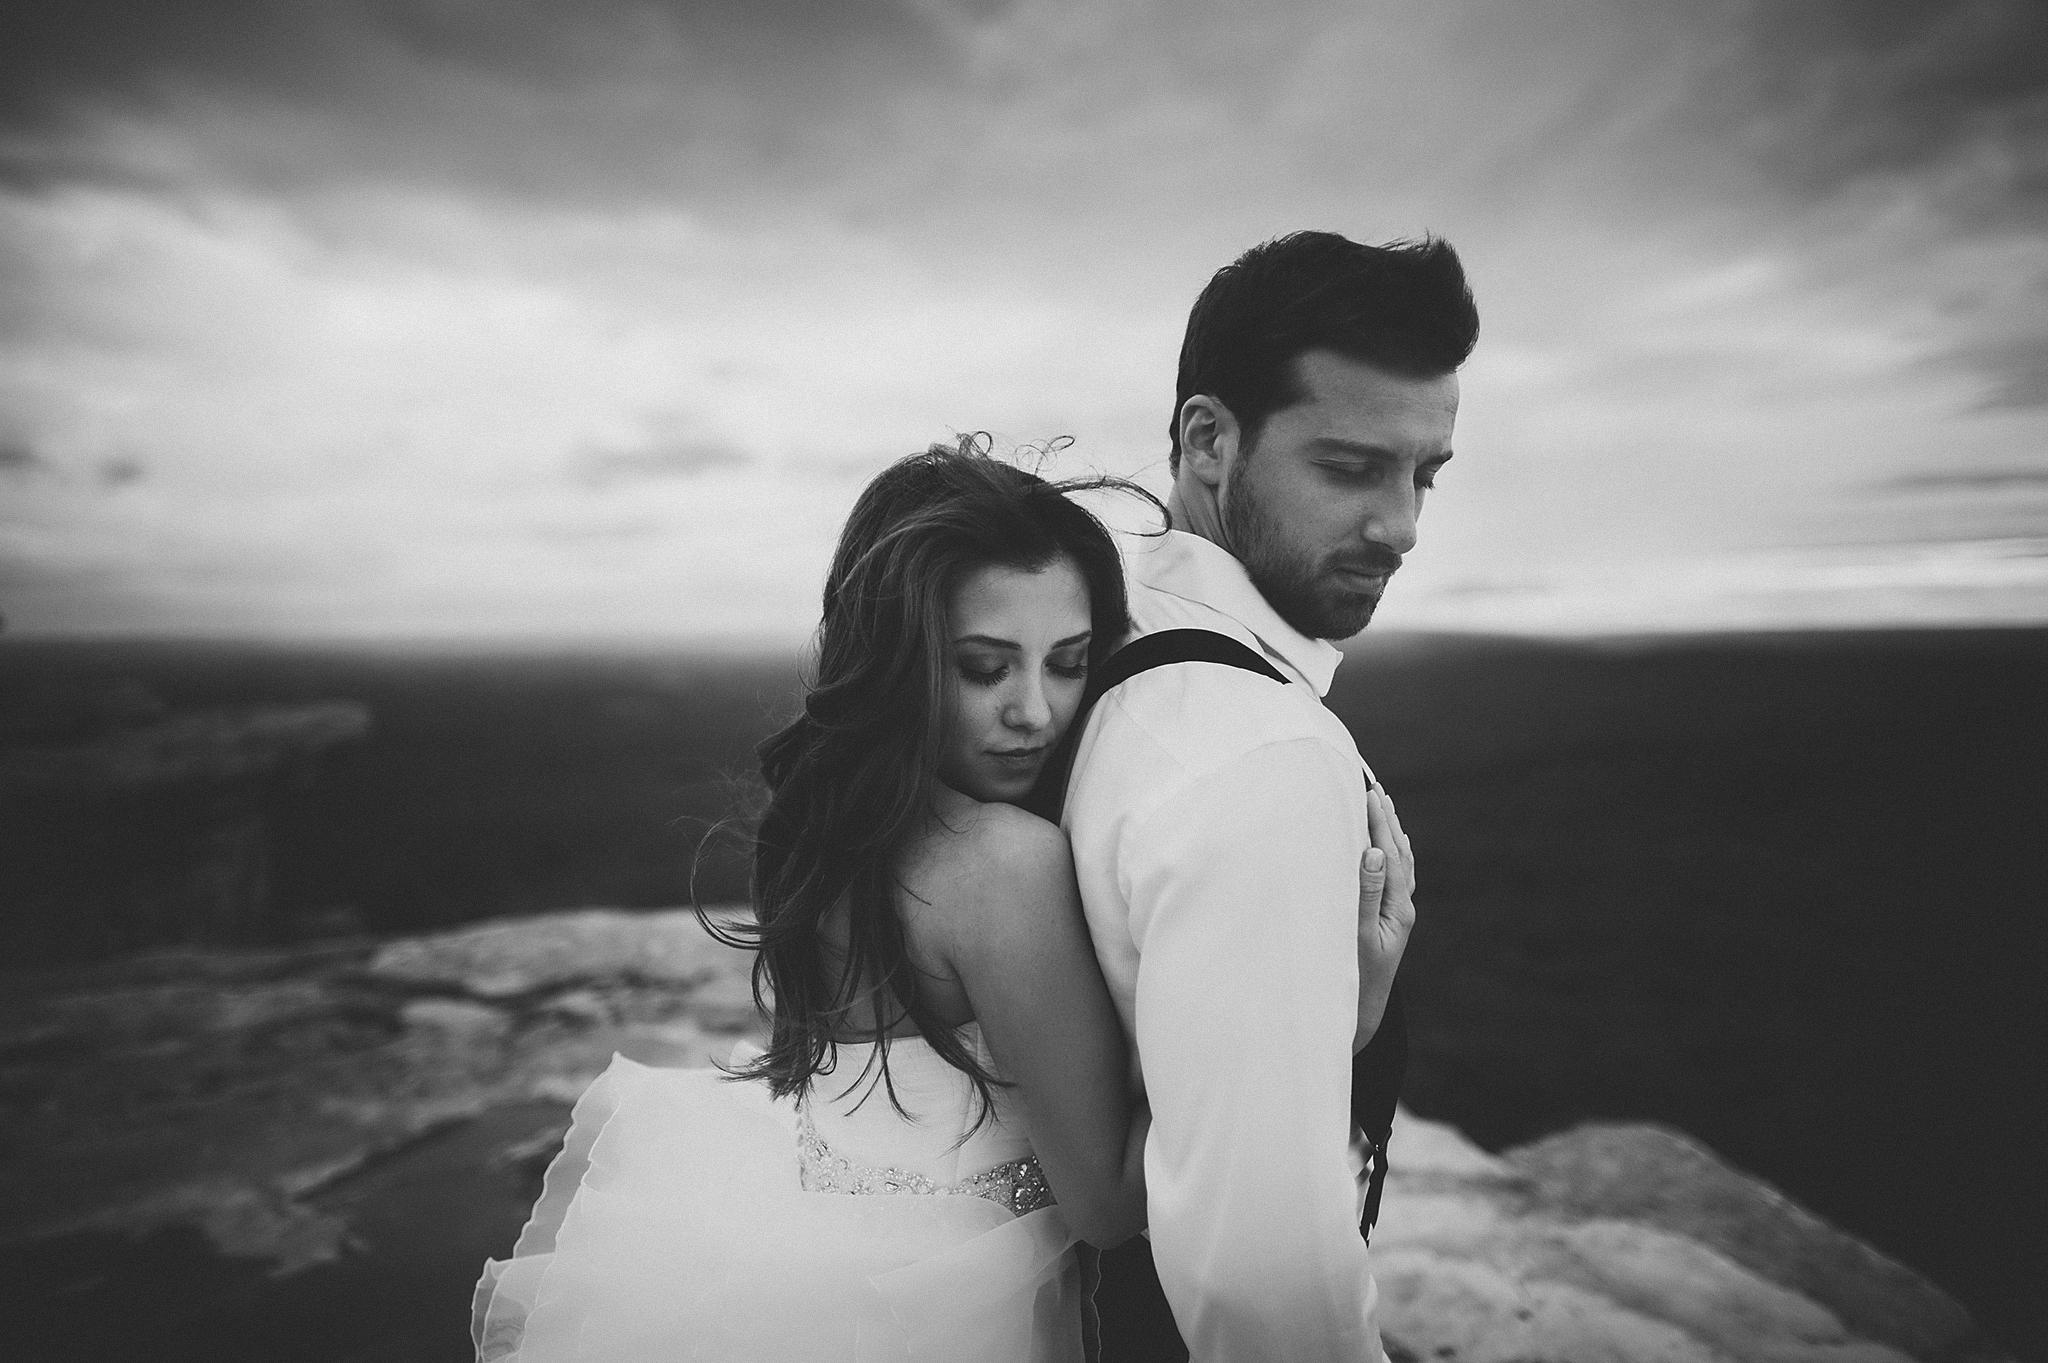 01-ny-elopement-photographer copy.jpg